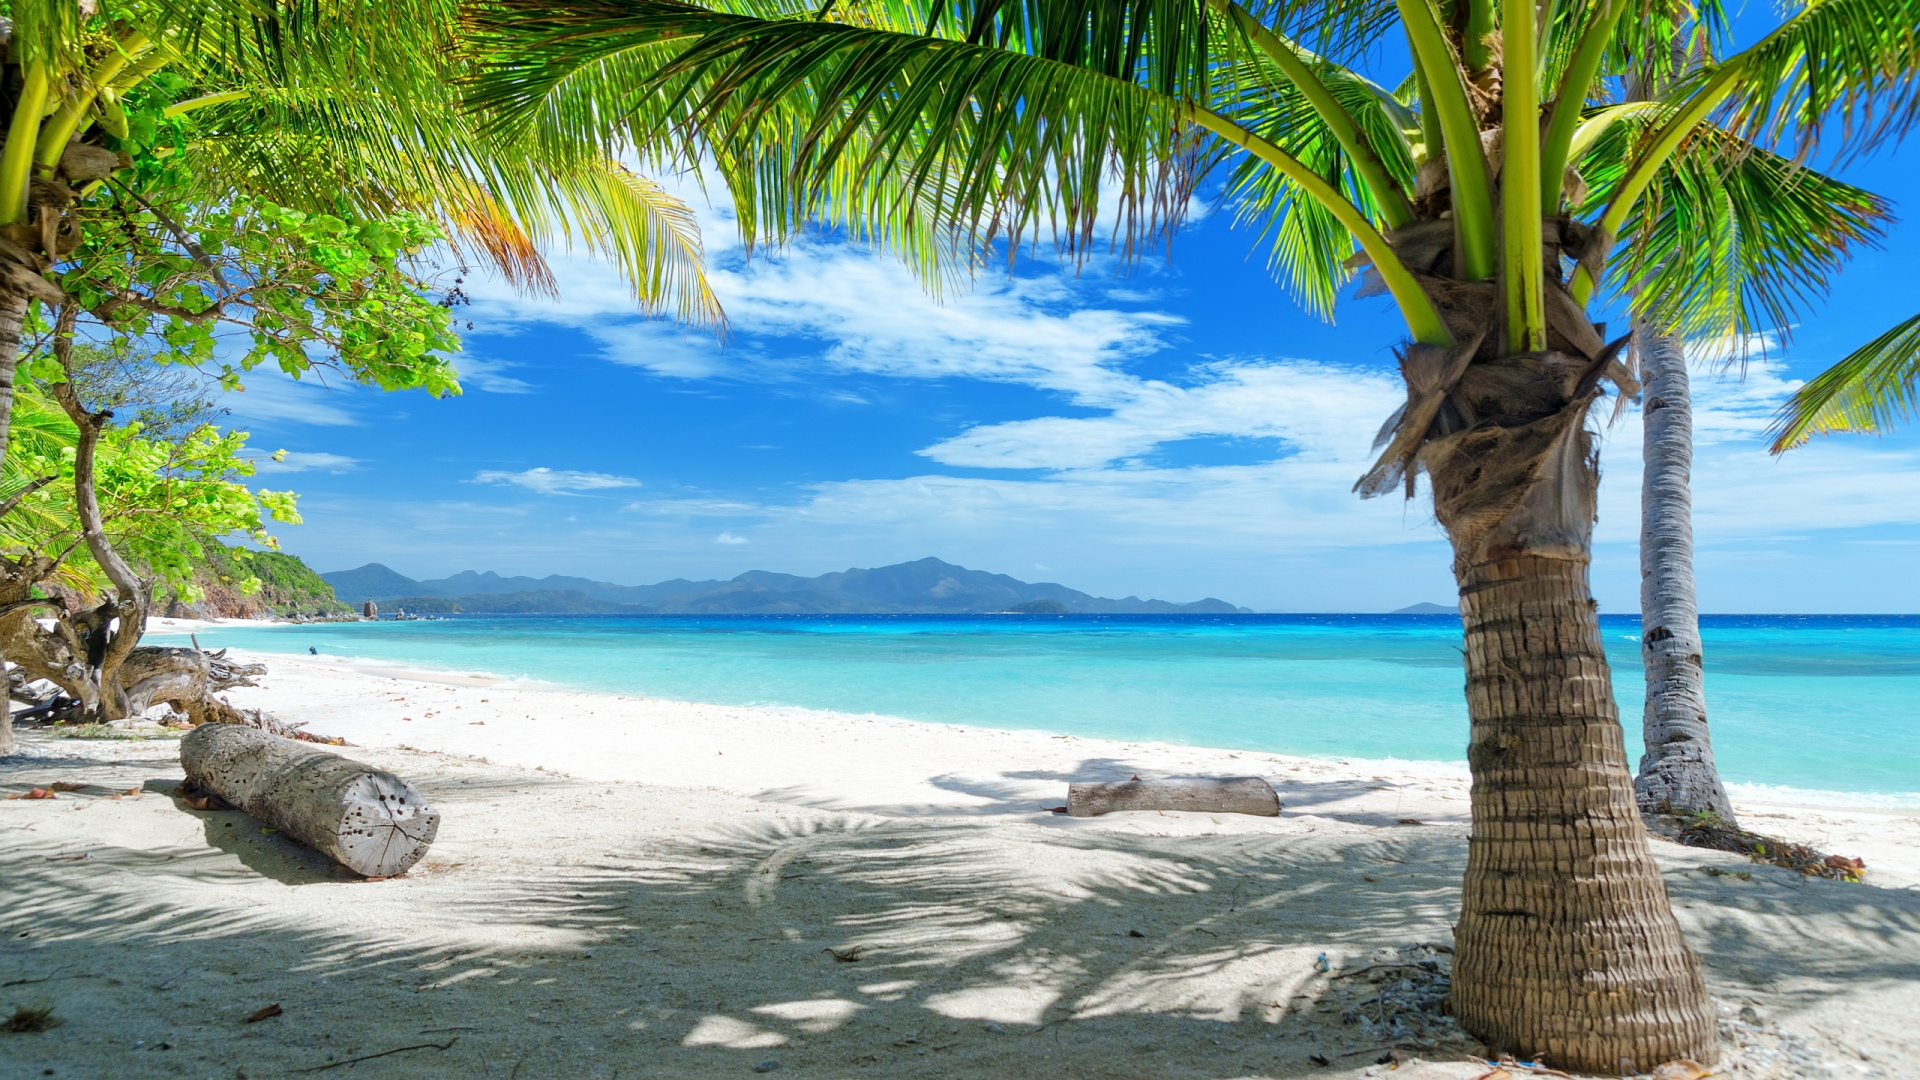 Natural Tropical